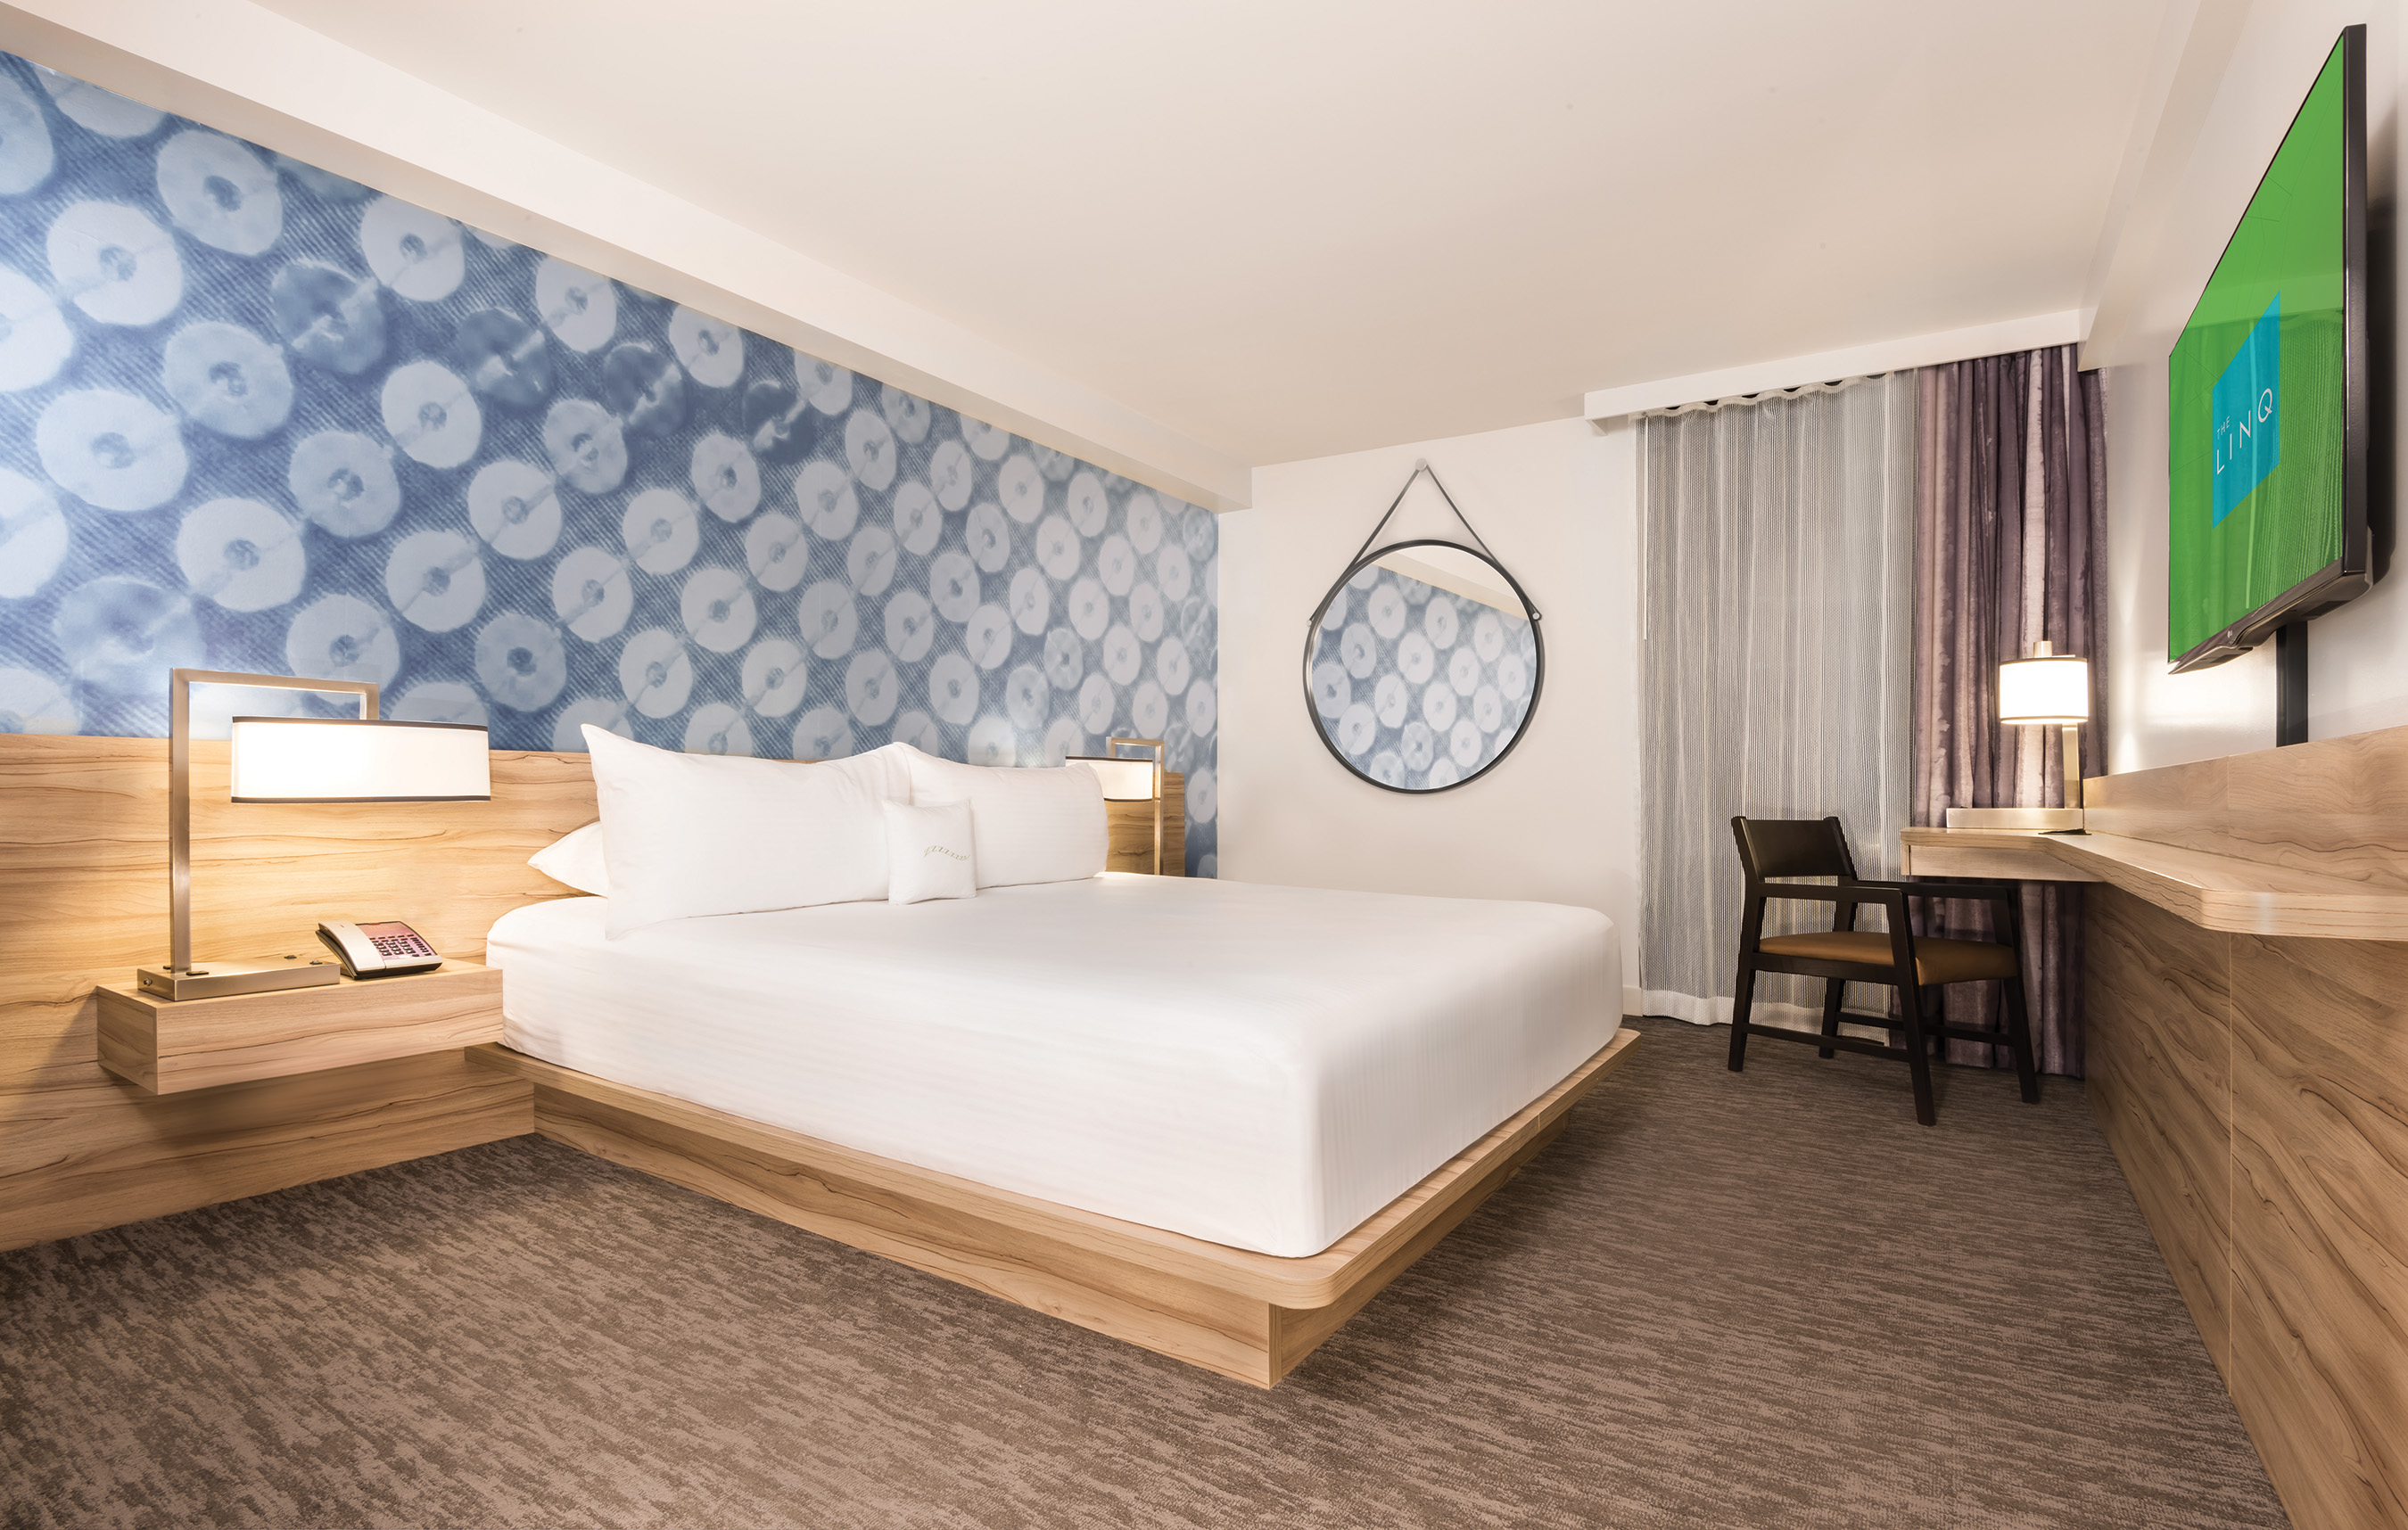 las the vegas shooter inside of room lair hotel killer trigger modal rooms